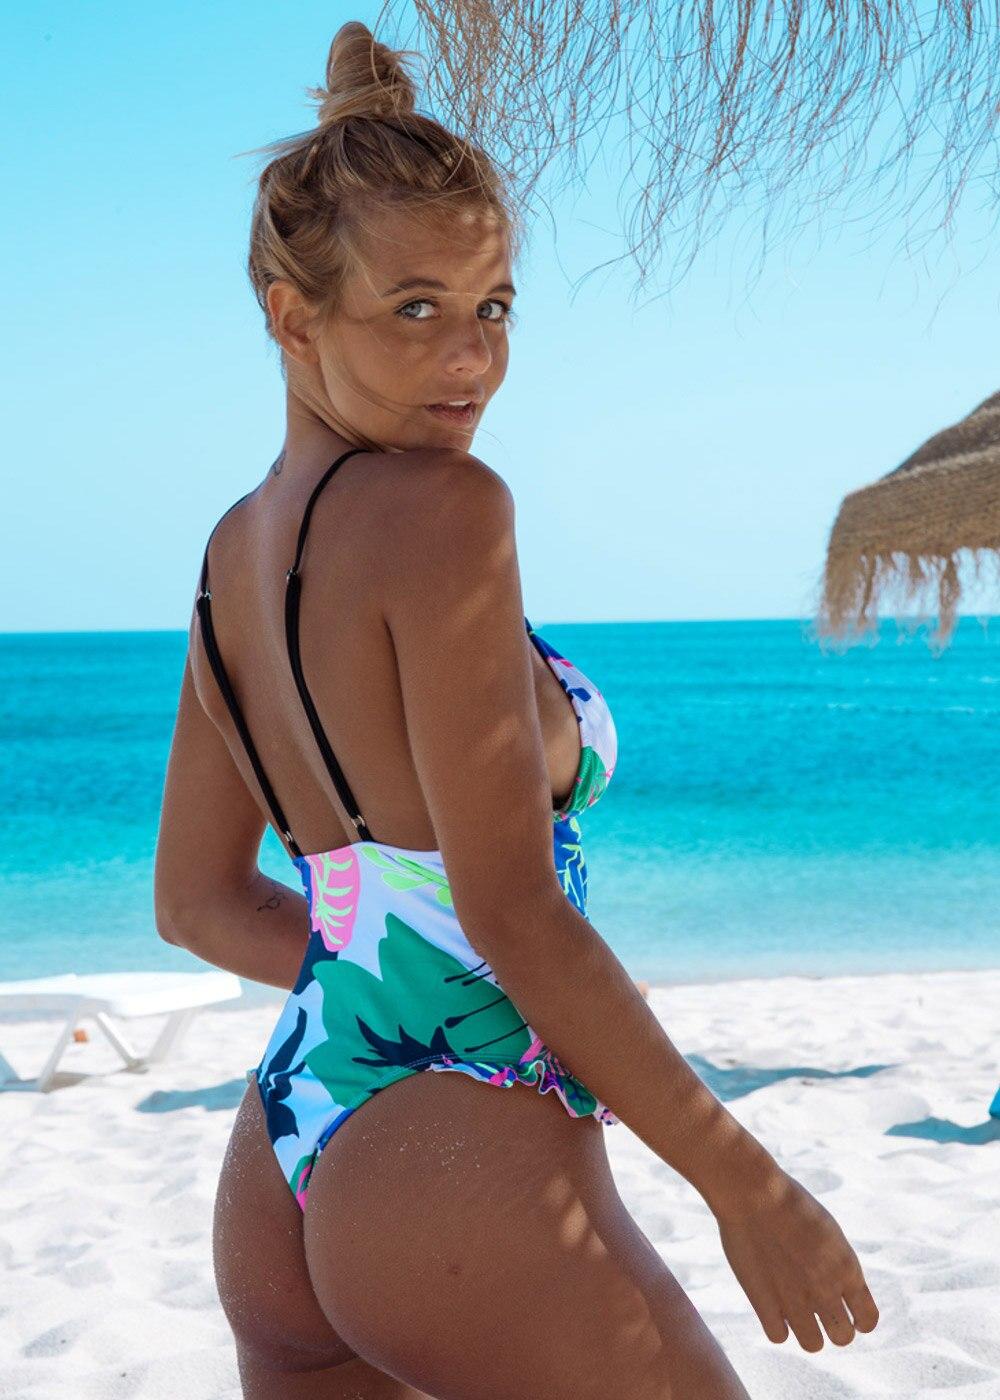 H1c74809ea6c143b78679f55d0cbe04497 2020 New Ruffle Bikinis Women Swimsuit Cross Bandage Swimwear Push Up Bikini Set Beach Bathing Suit Brazilian Biquni Print